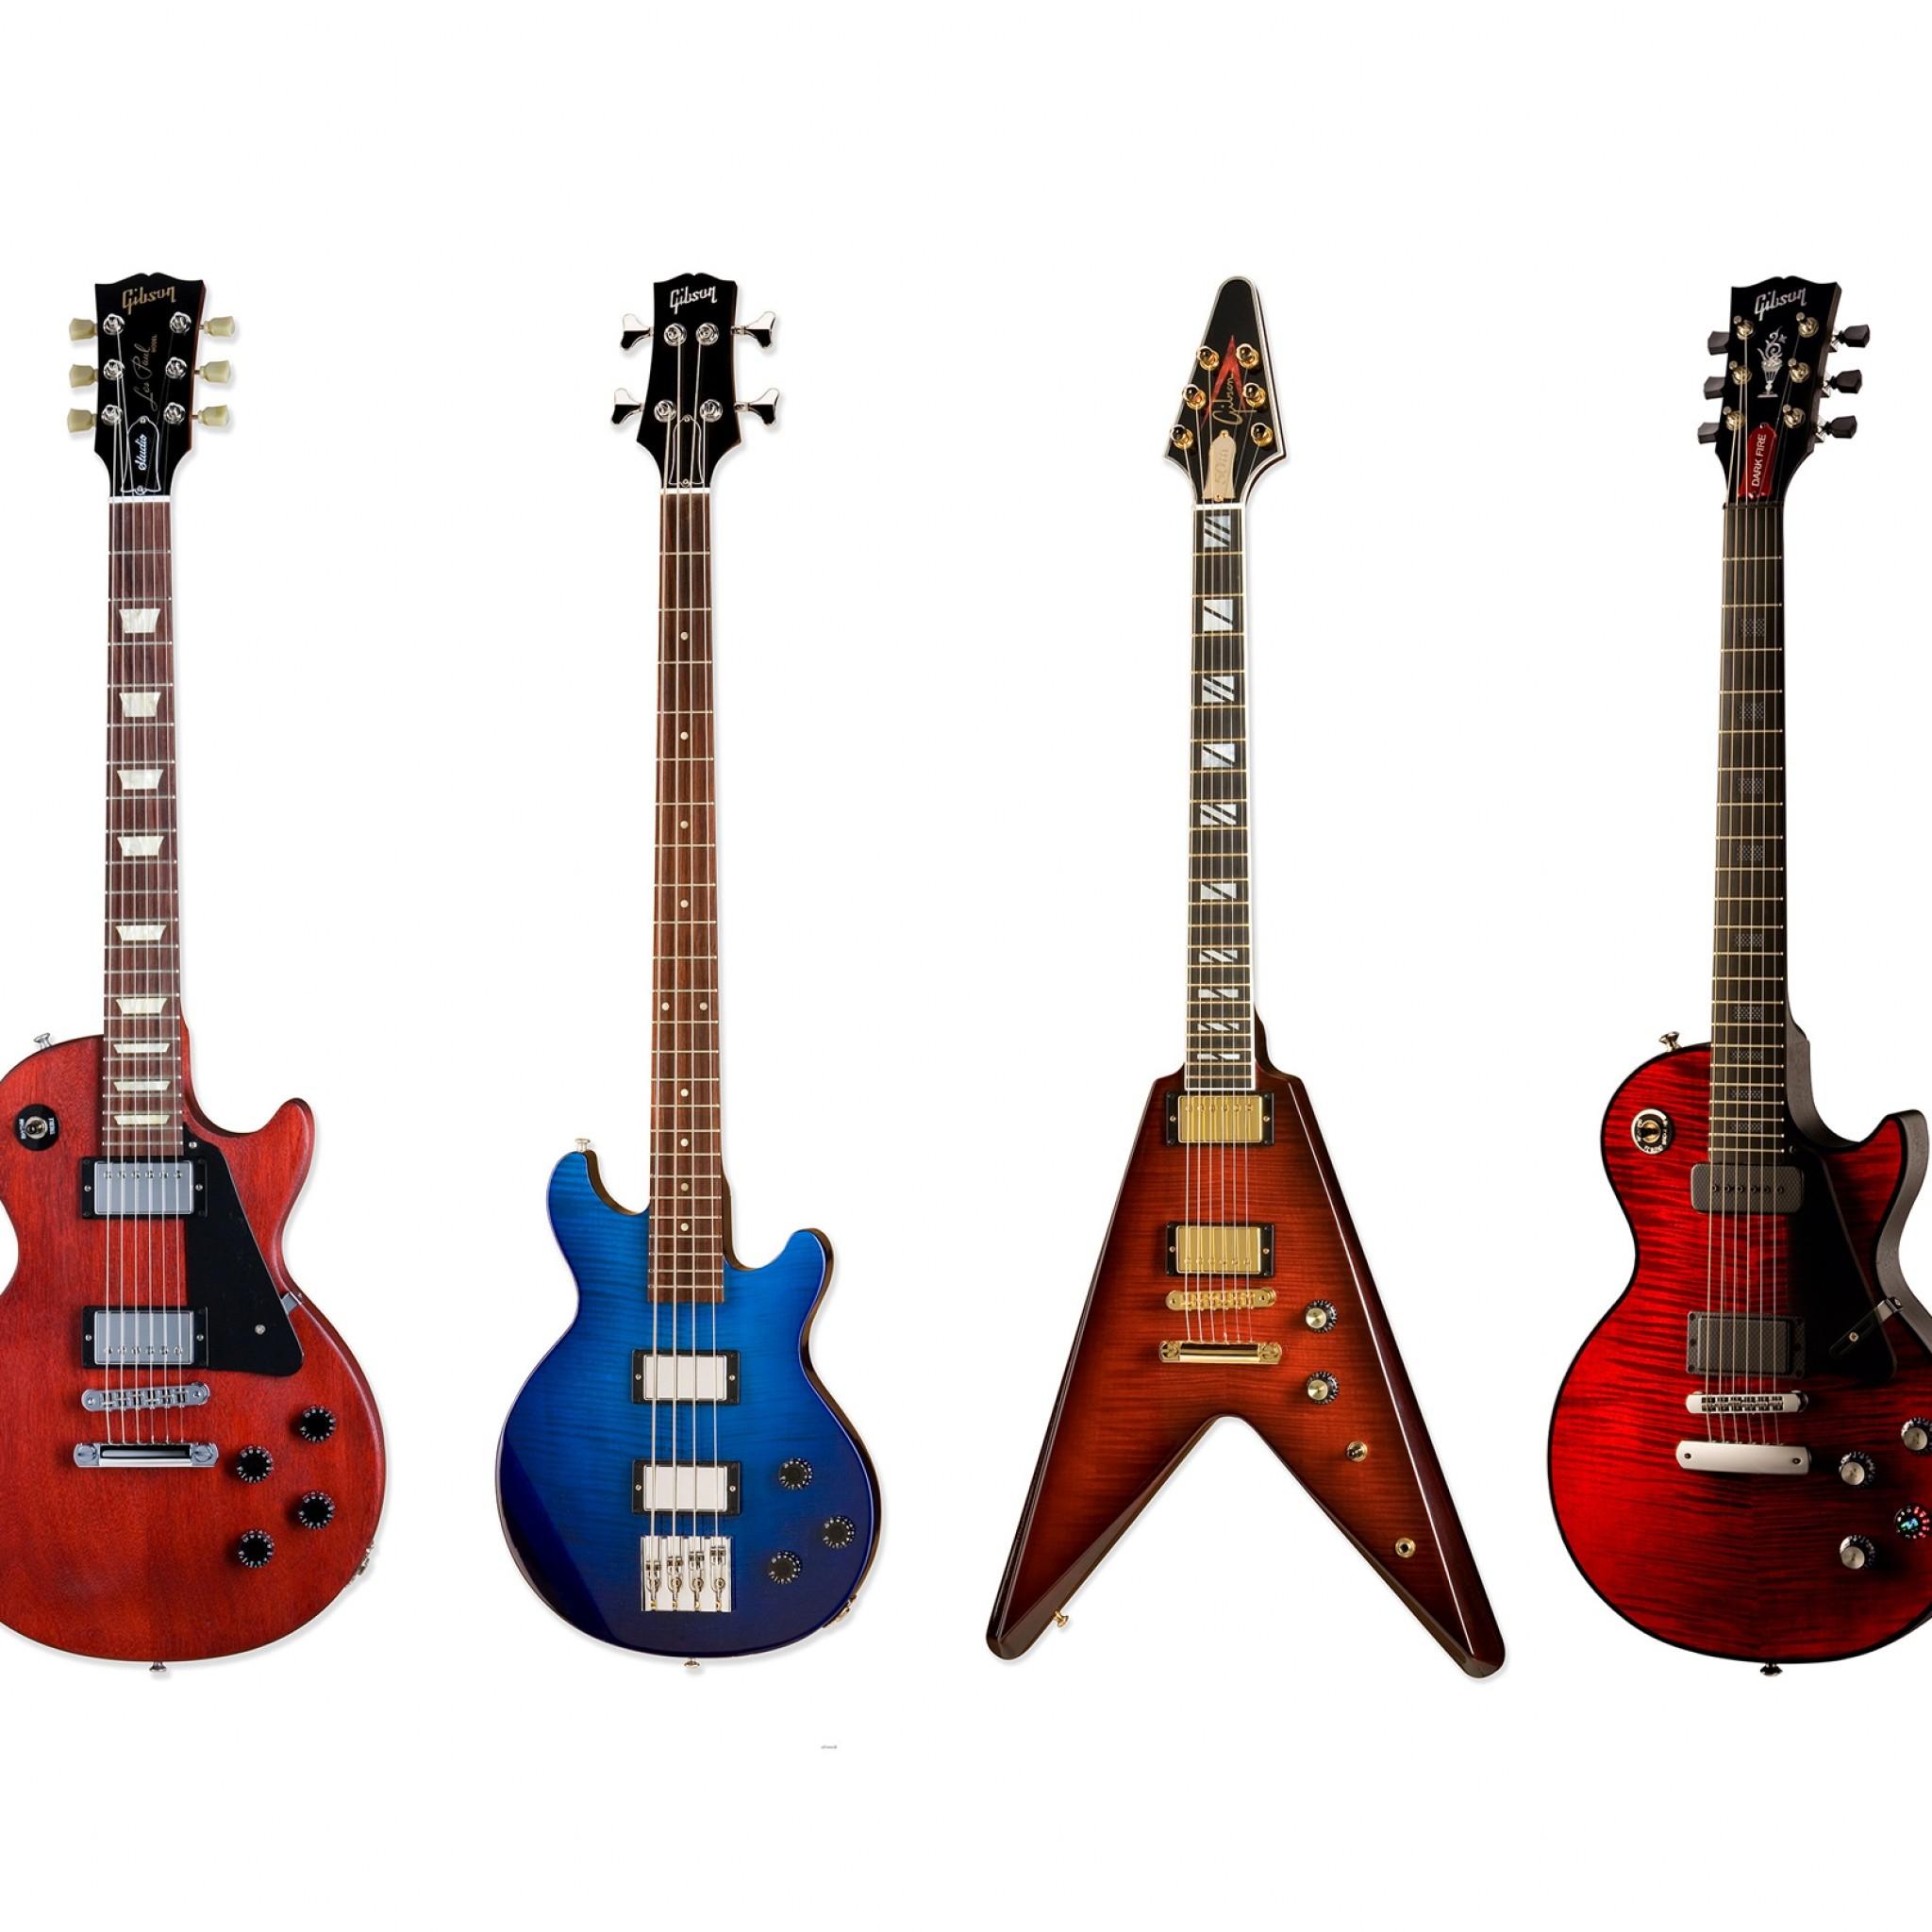 Wallpaper Hd Nature Guitar: Gibson Guitar Wallpaper HD (54+ Images